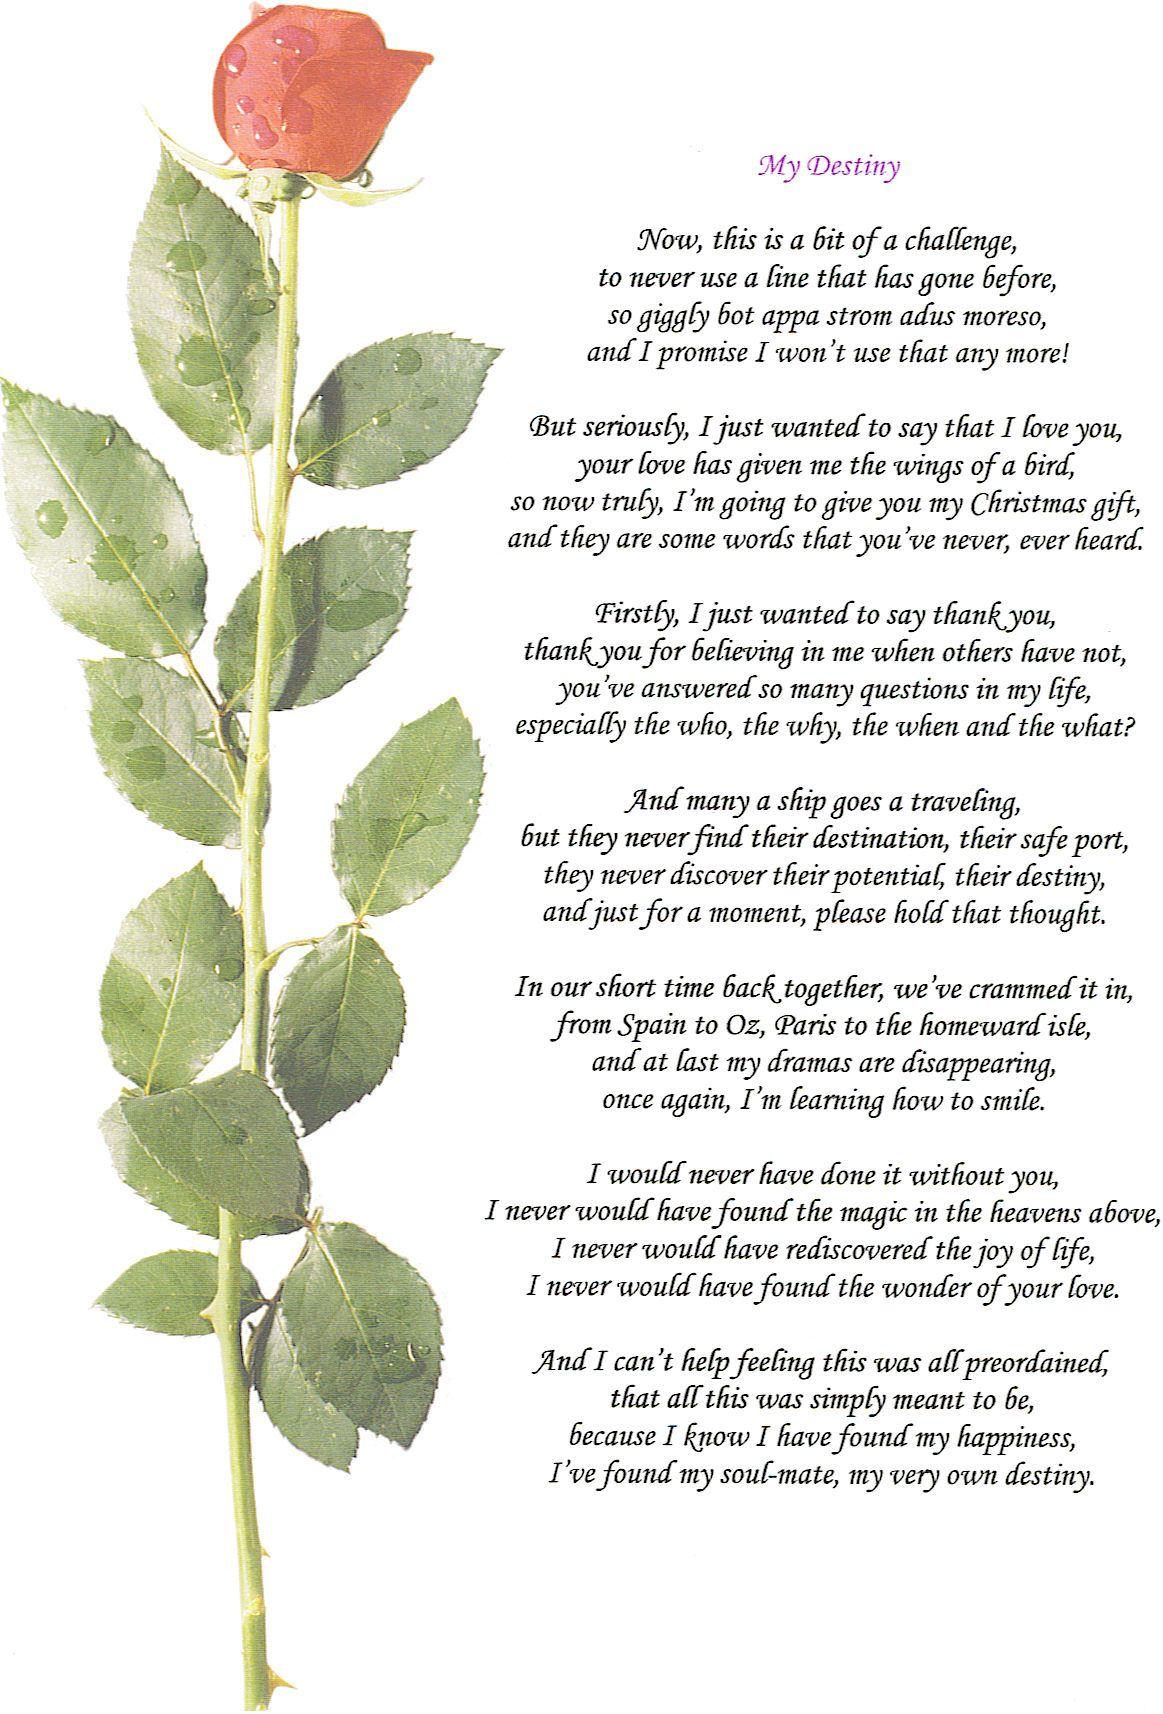 2nd Wedding Anniversary Poems | deweddingjpg.com